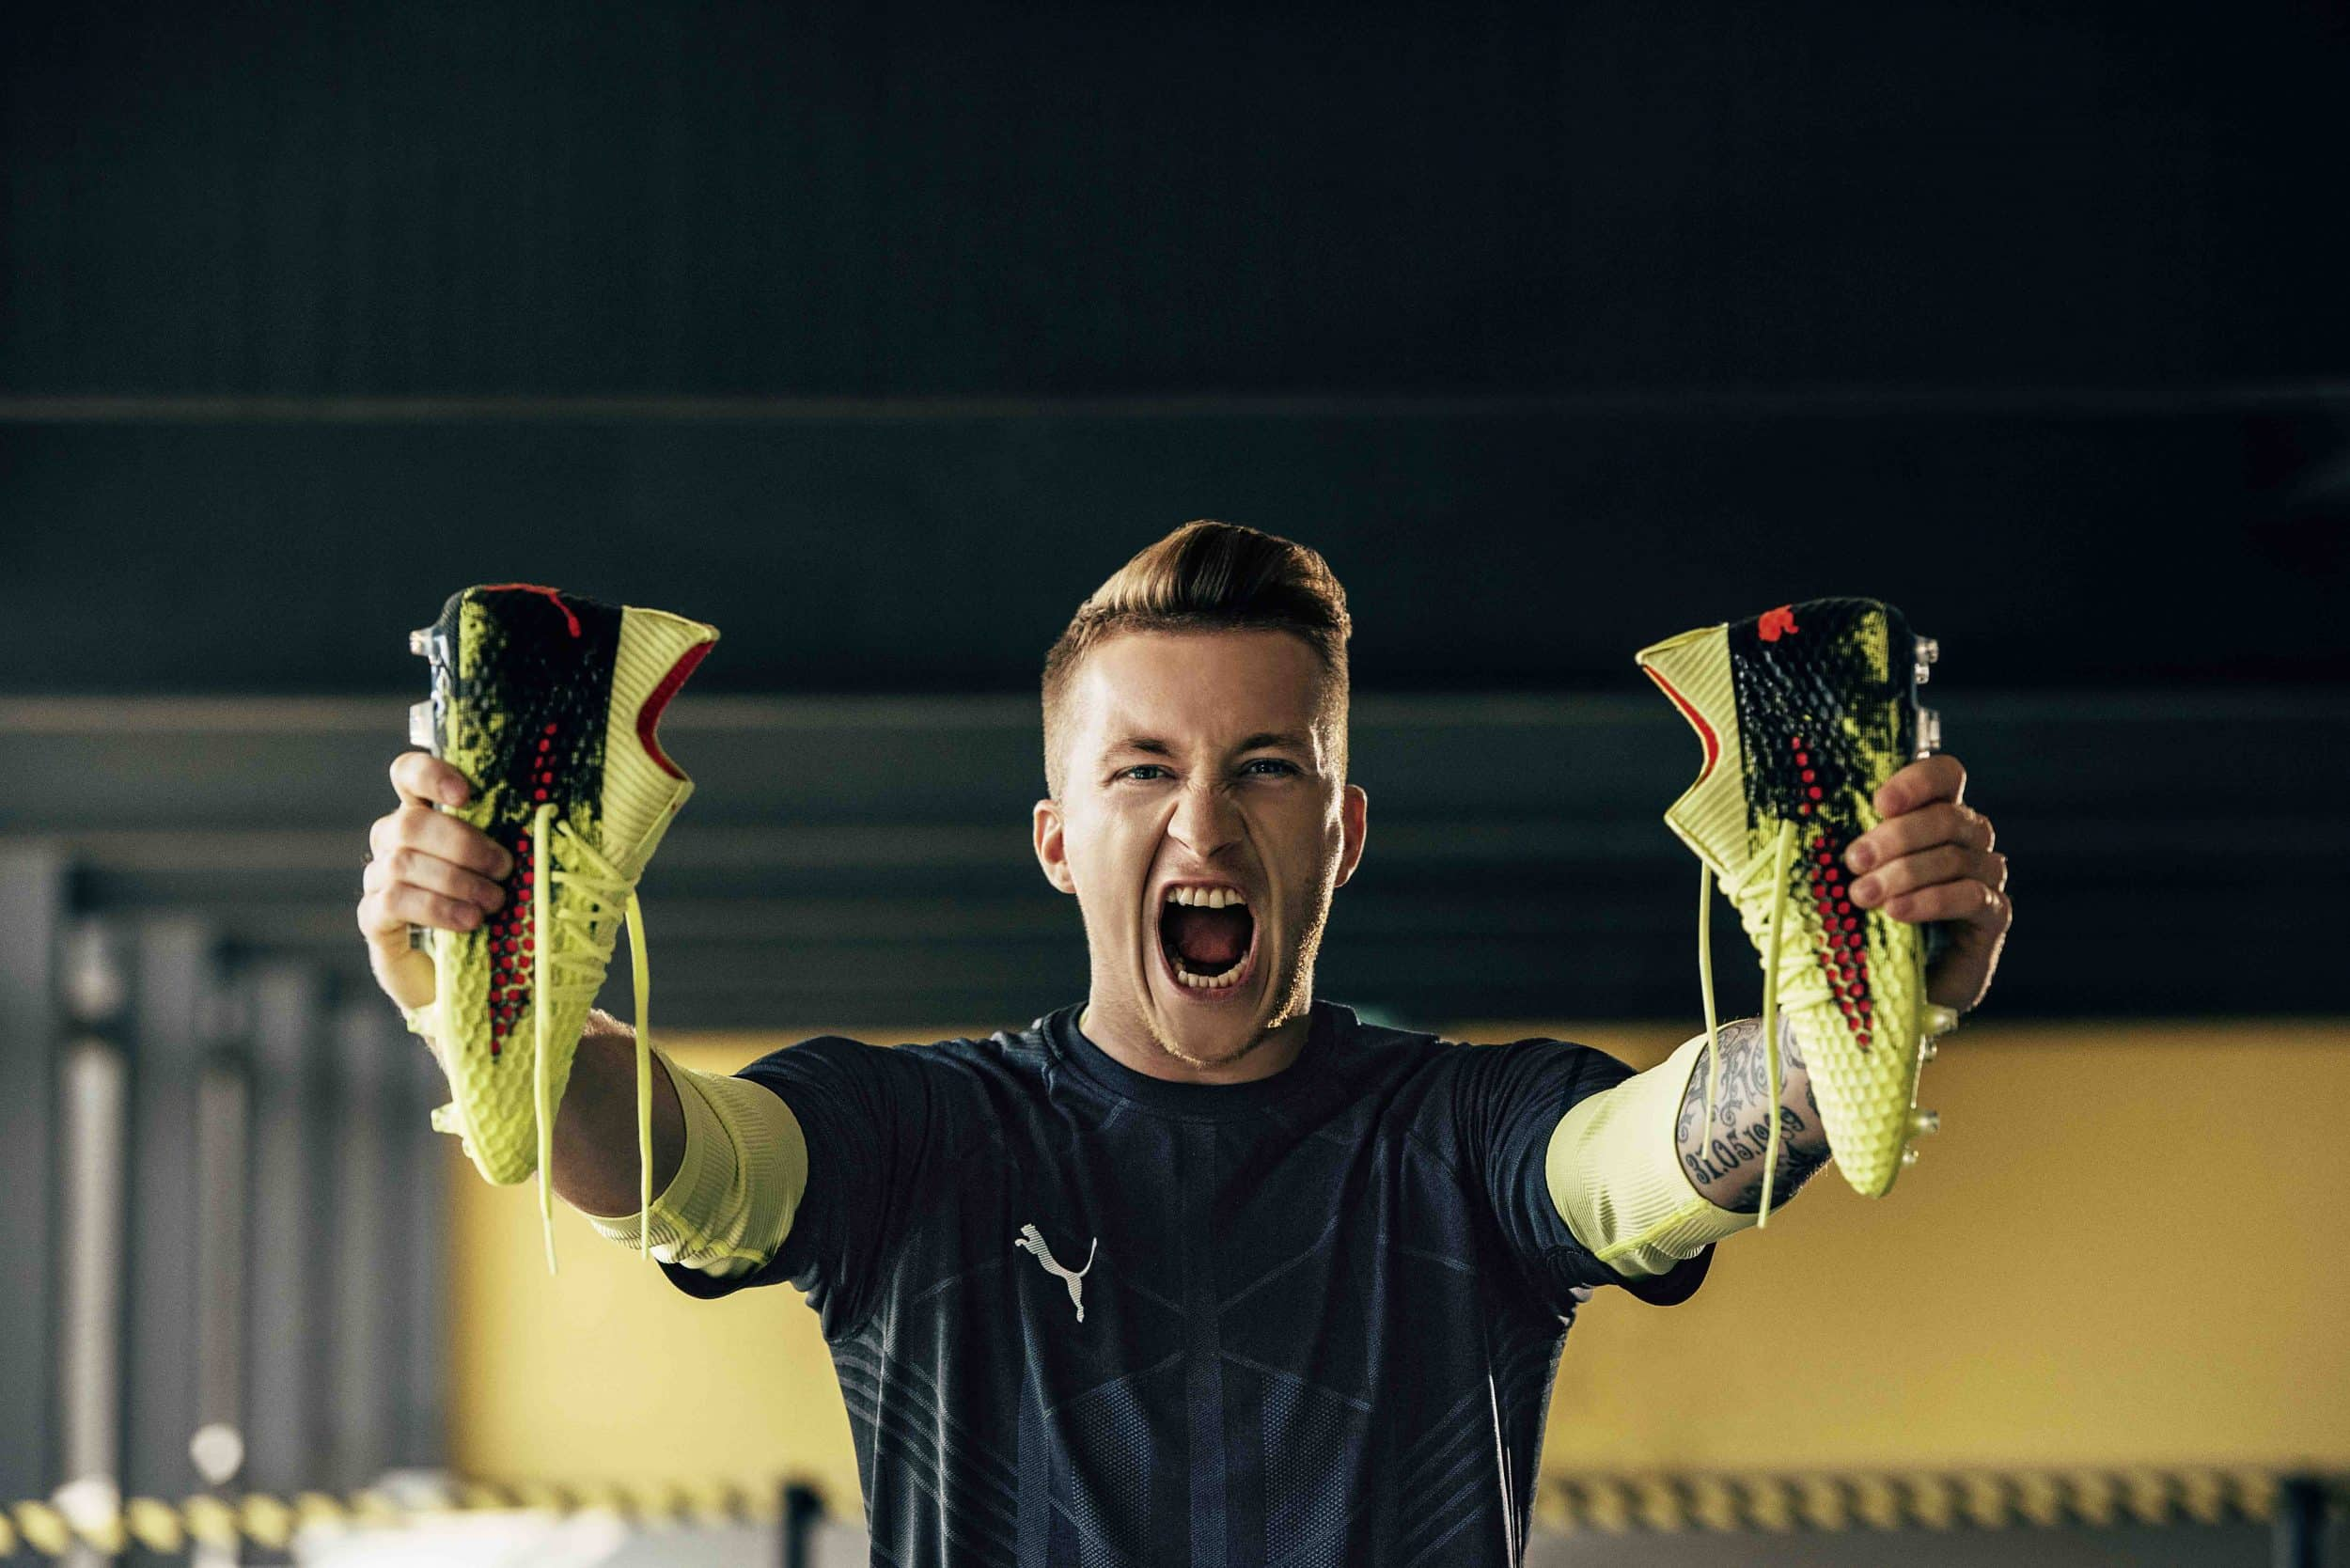 chaussure-football-puma-future-netfit-marco-reus-janvier-2018-2